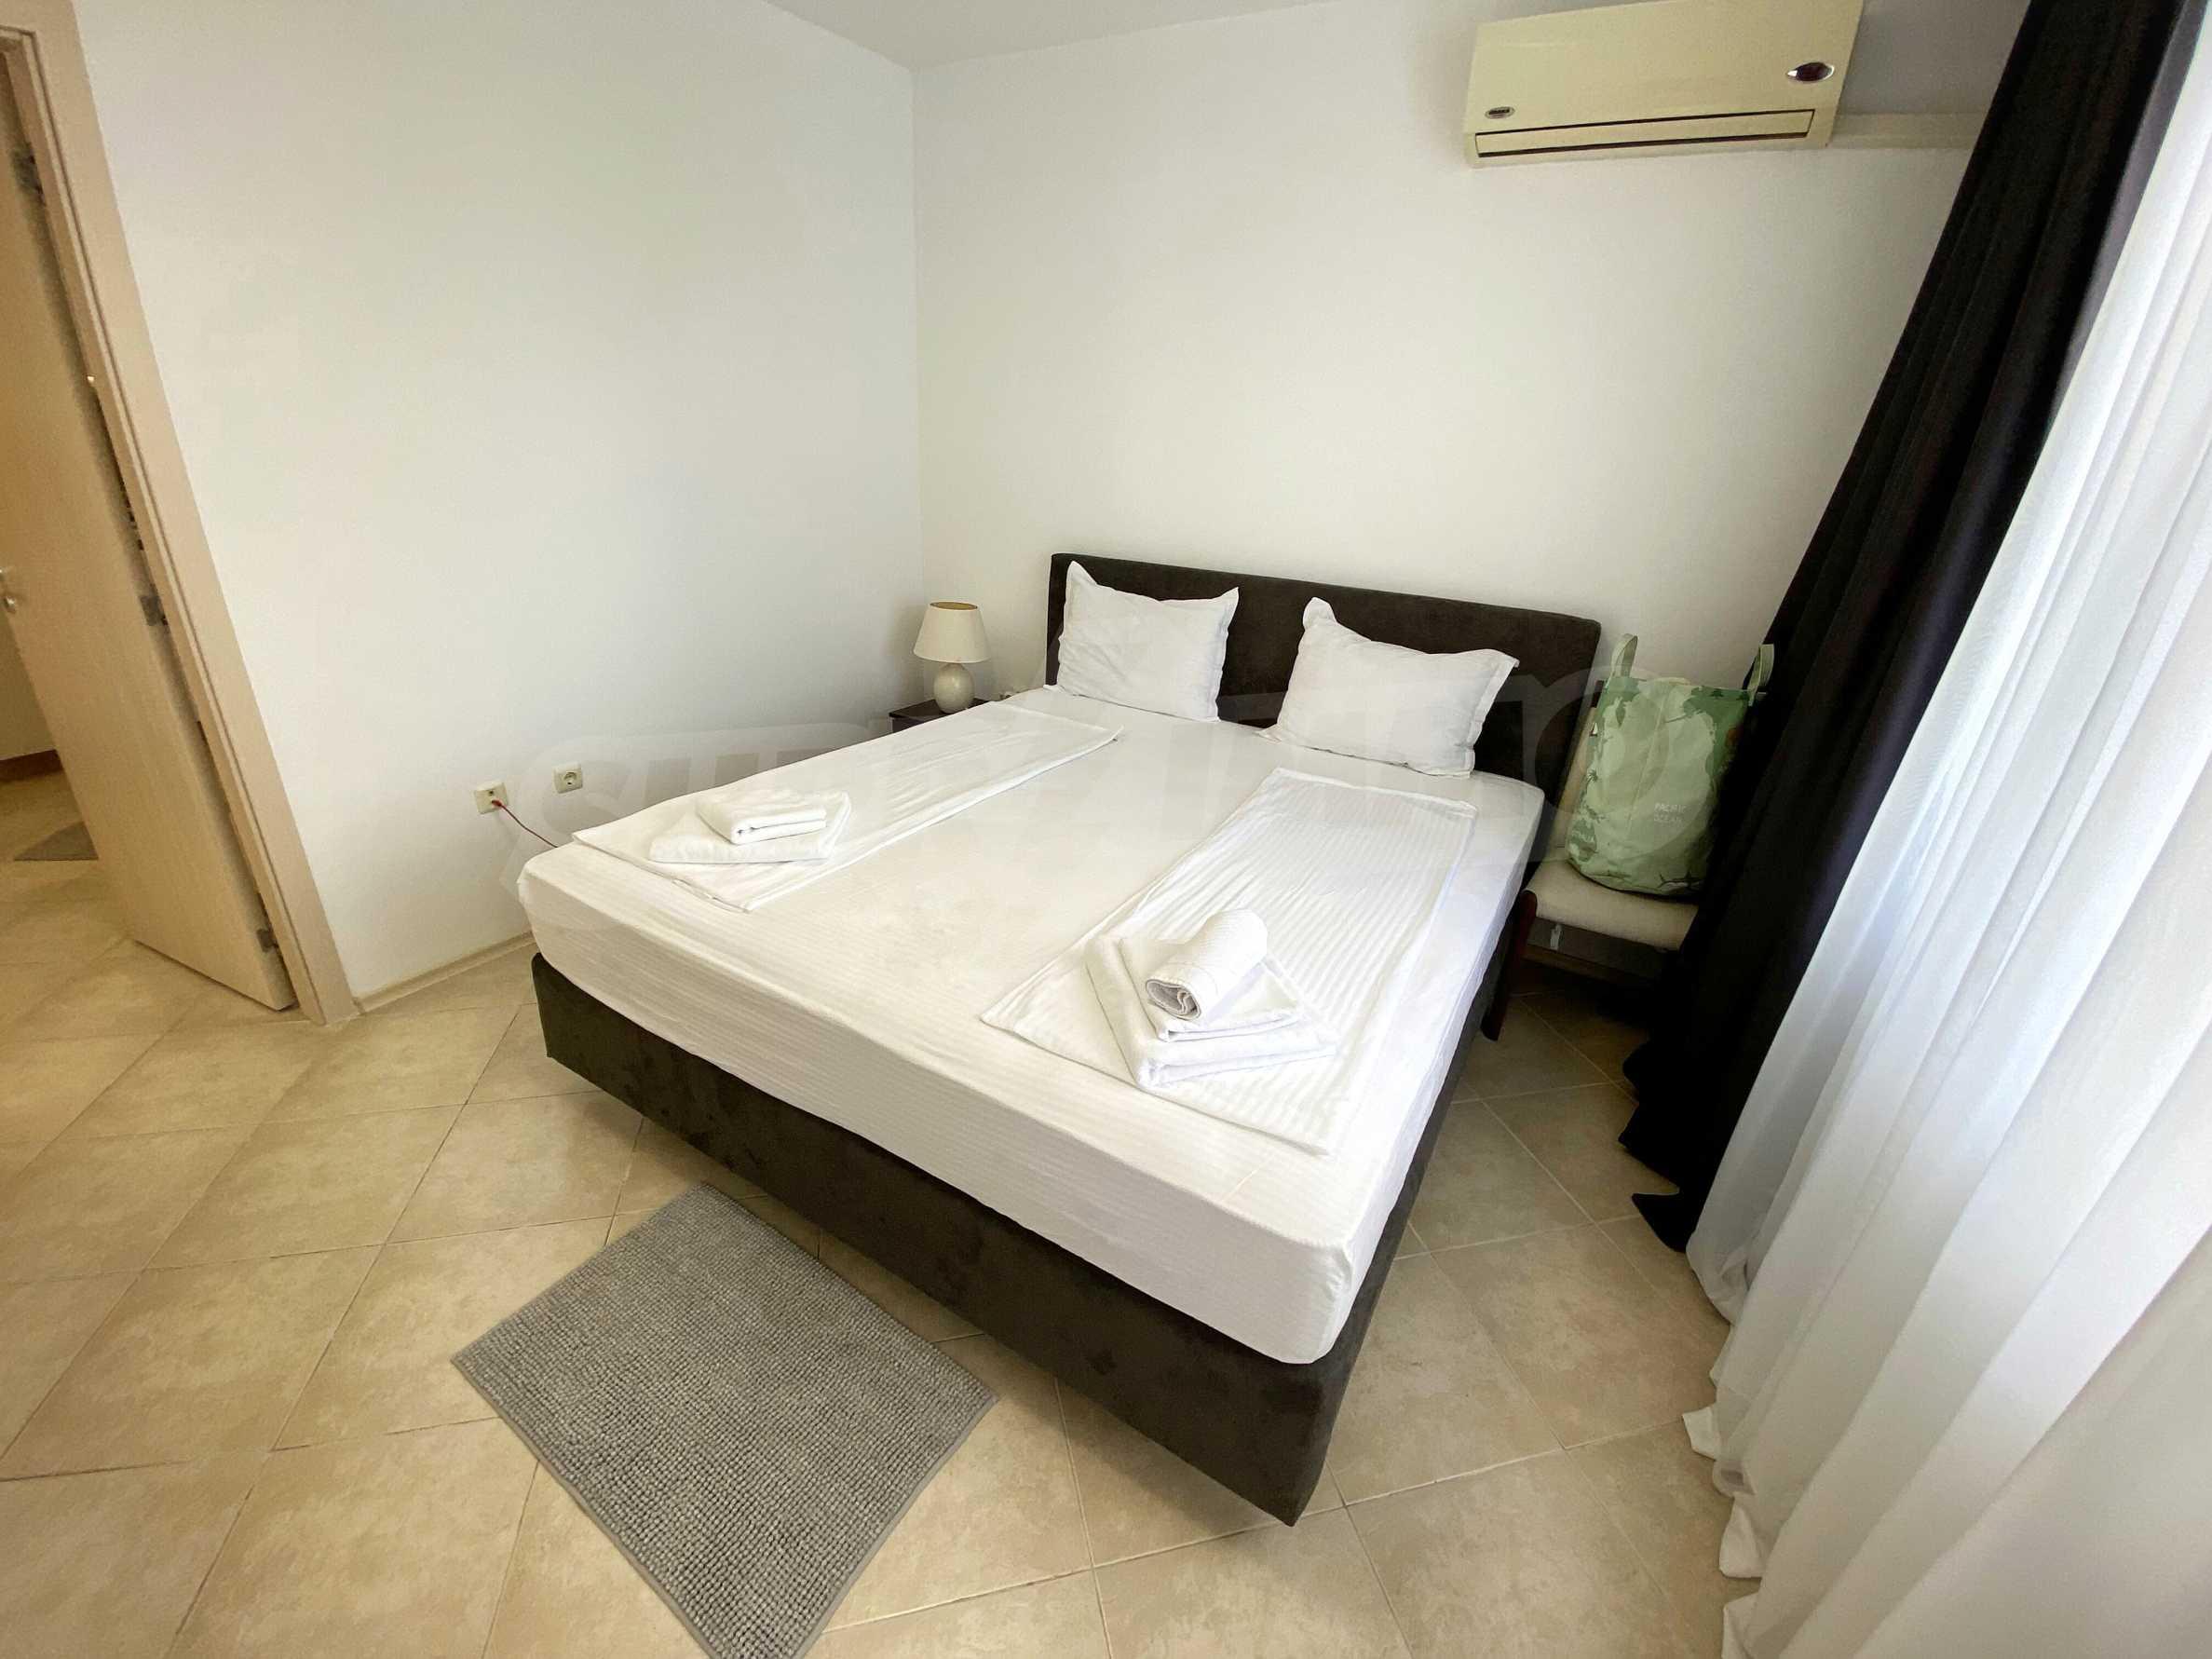 Тристаен апартамент близо до плажа в комплекс Емберли в Лозенец (ап. №201) 18